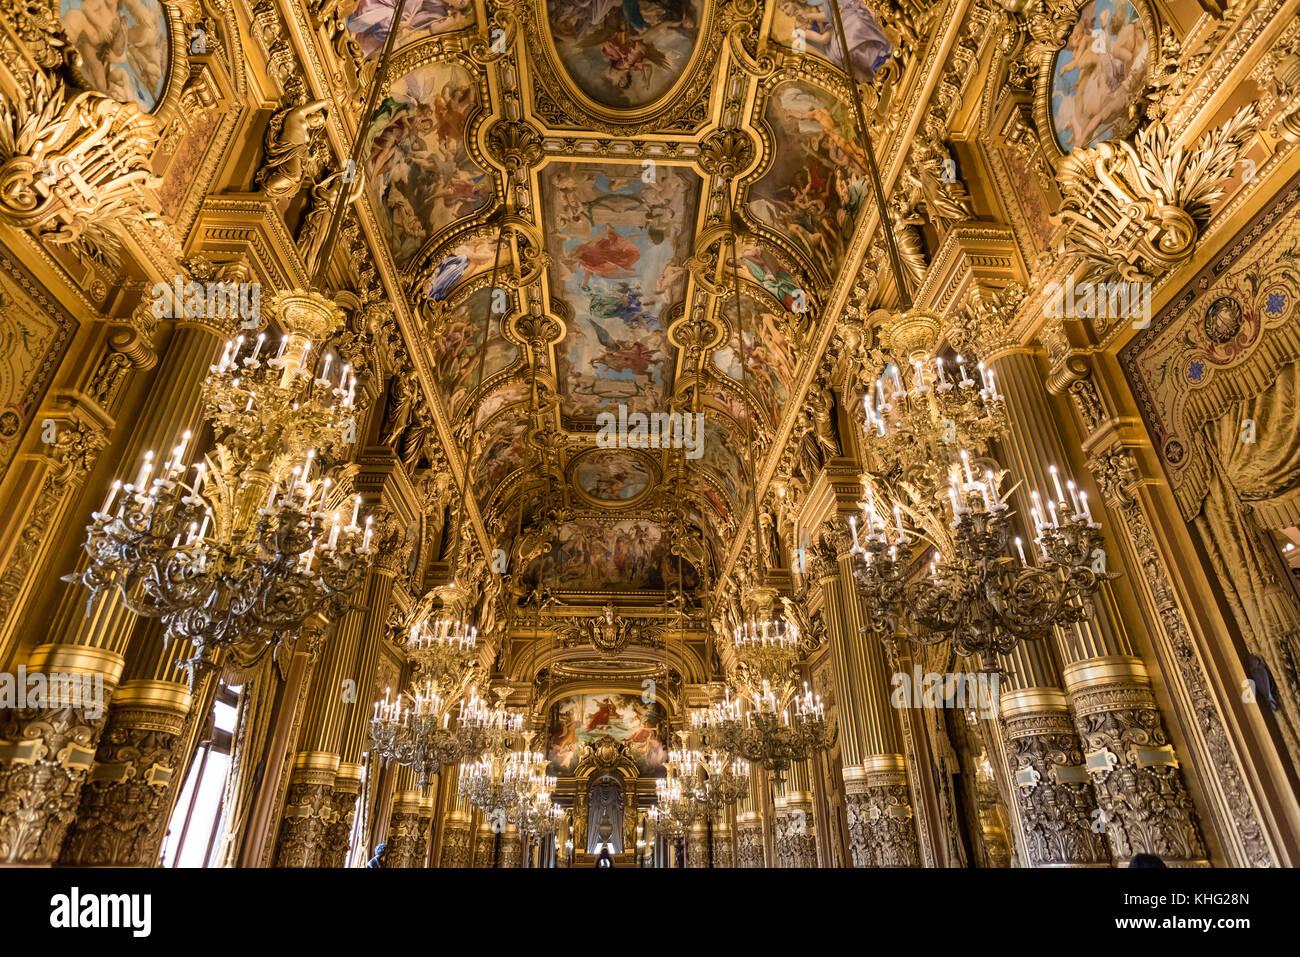 Ornate ceilings of the grand foyer of Palais Garnier, opera of Paris - Stock Image